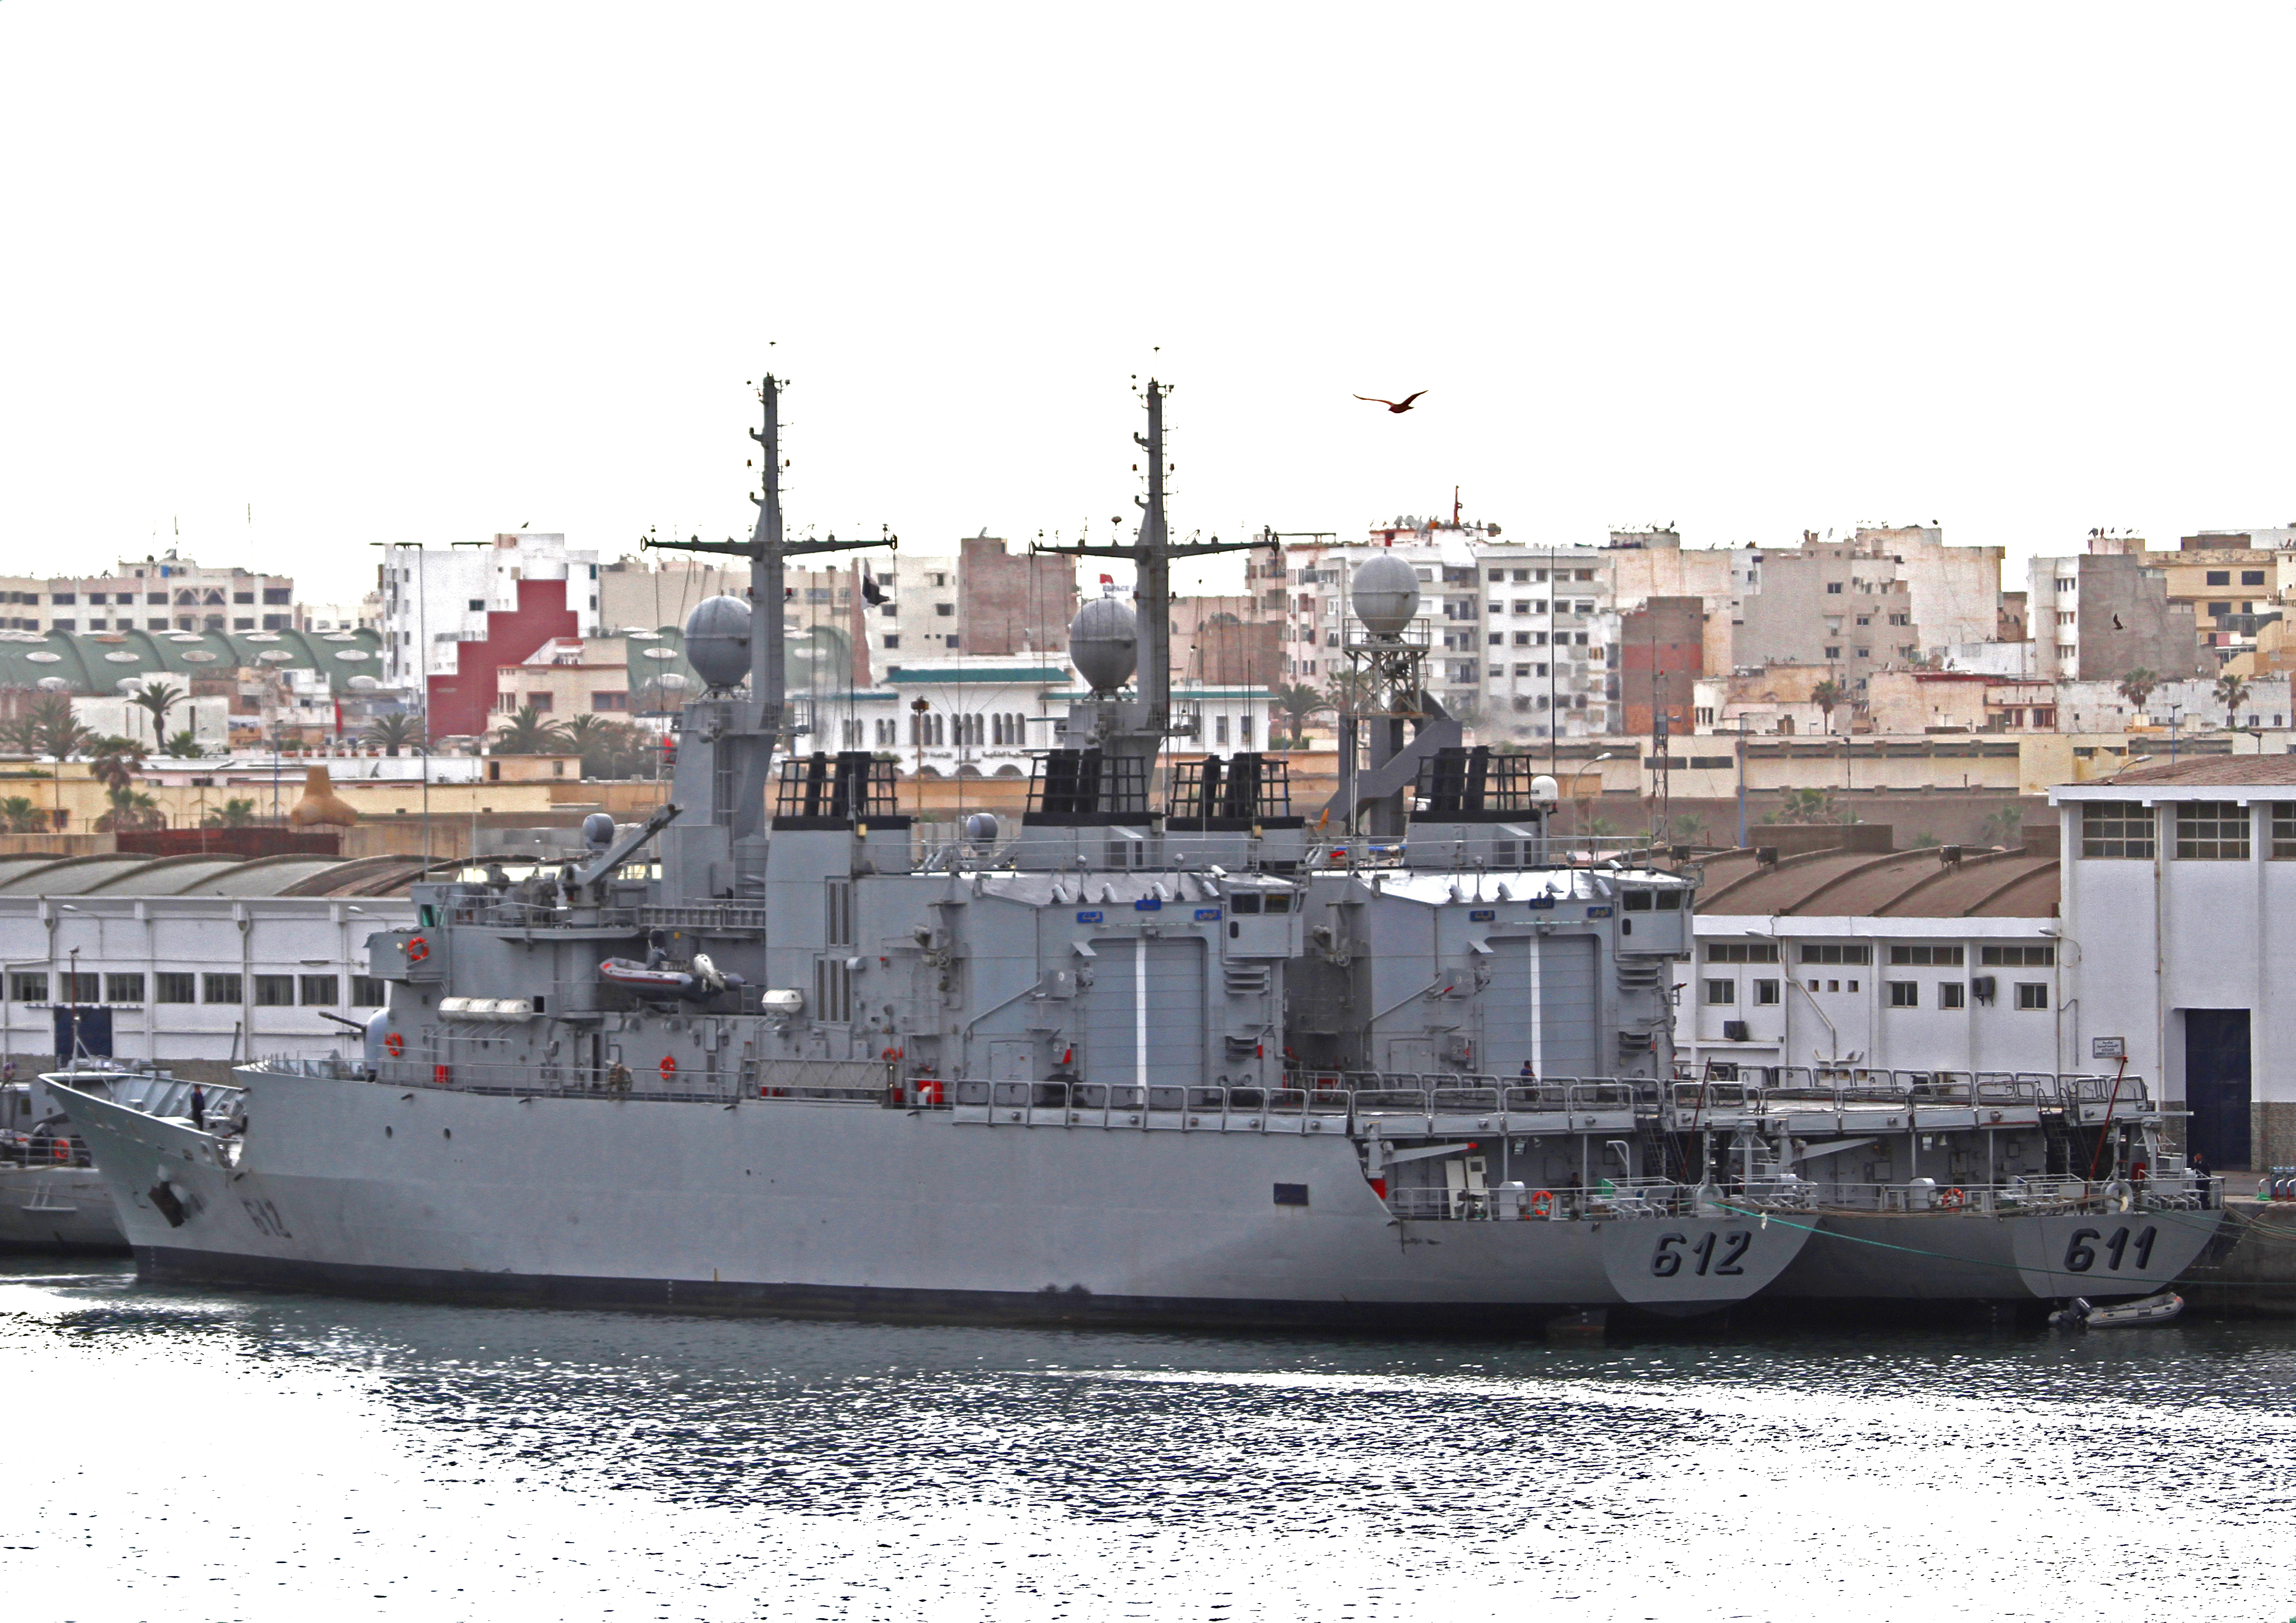 Royal Moroccan Navy Floréal Frigates / Frégates Floréal Marocaines - Page 13 39440807752_1db4648daf_o